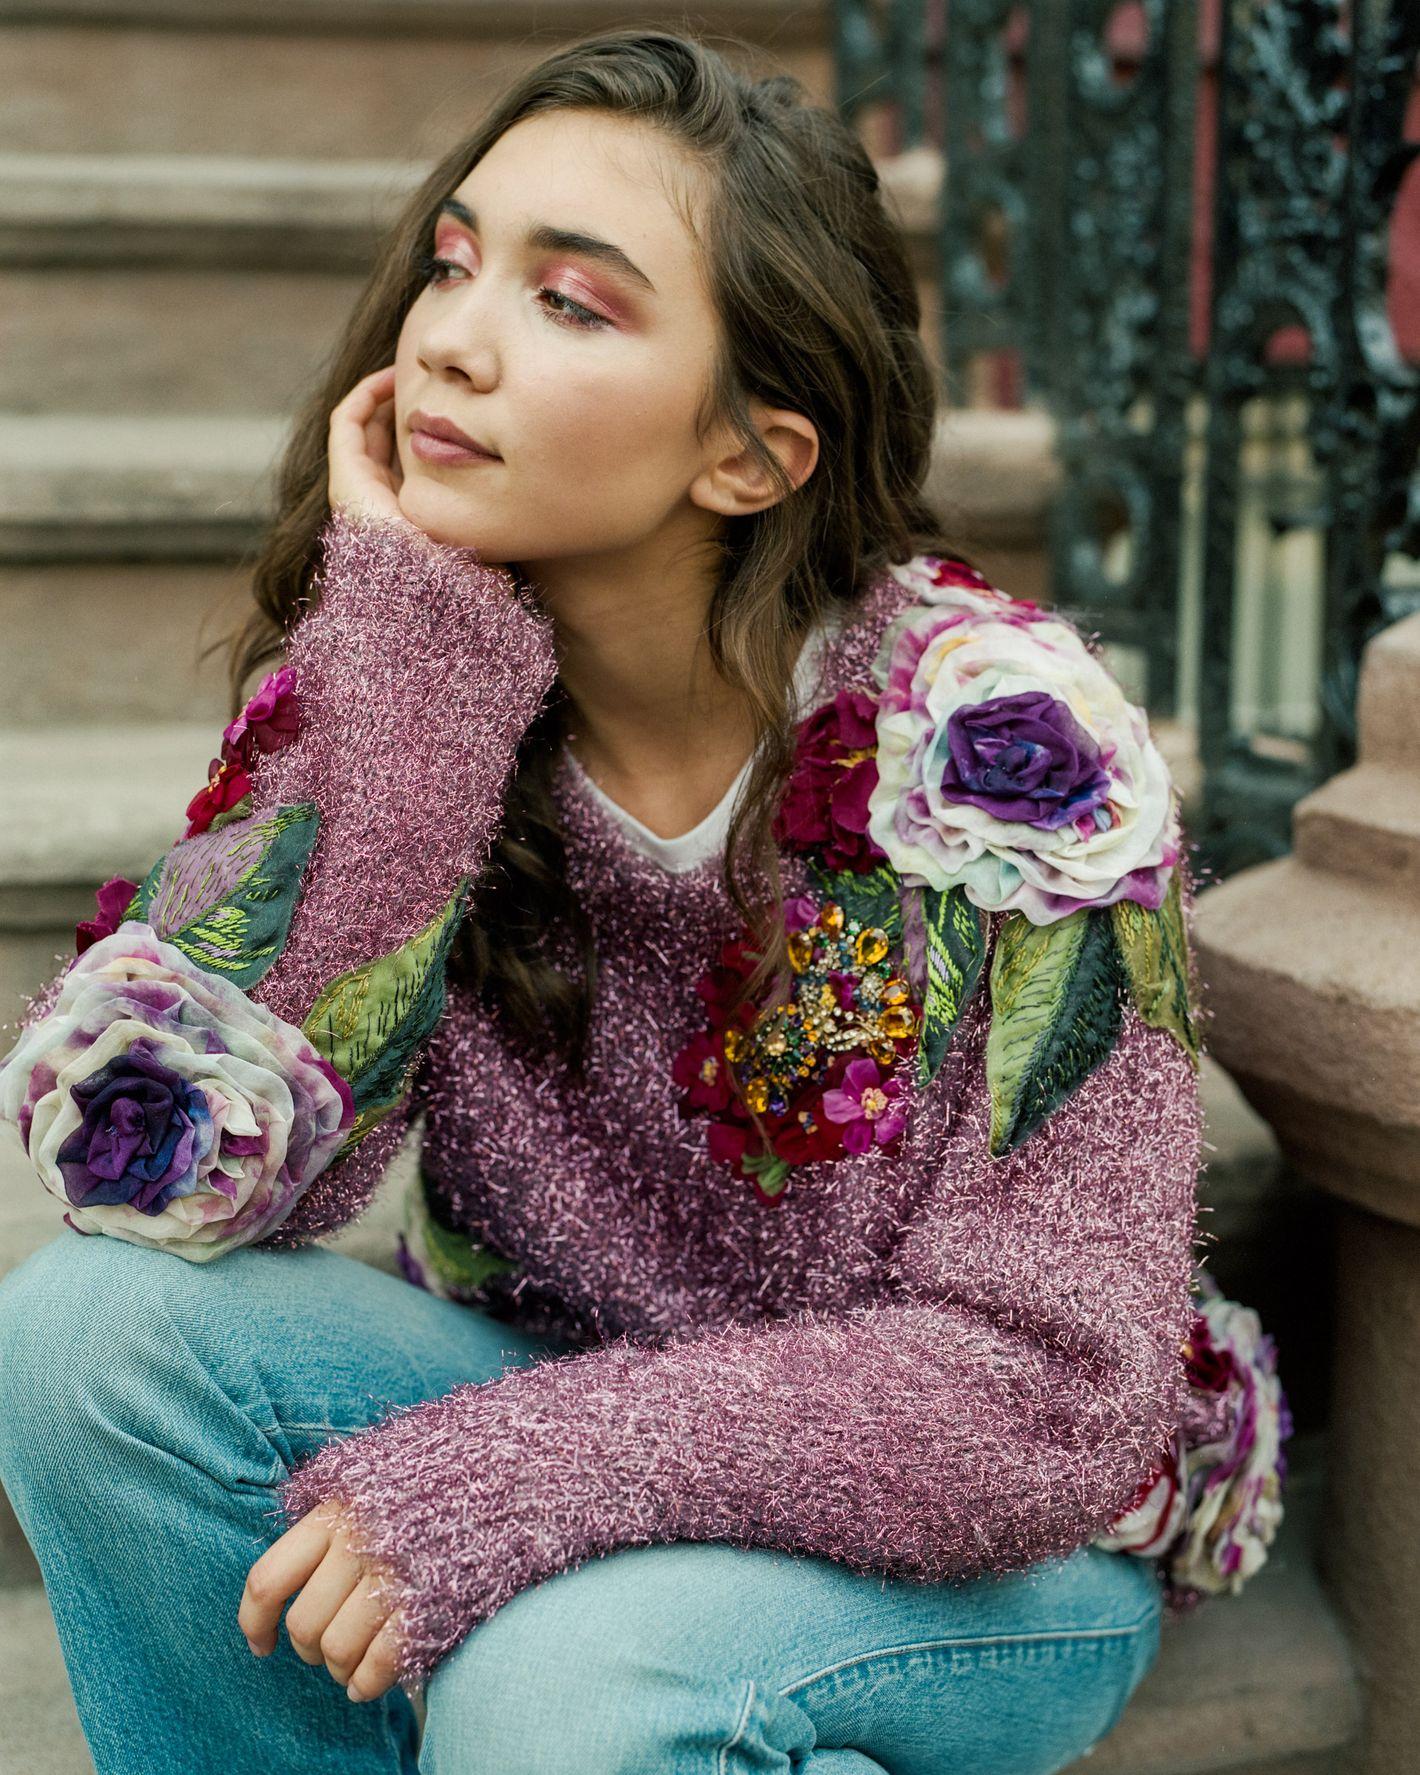 Girl Meets World's Rowan Blanchard on Feminism, Hollywood